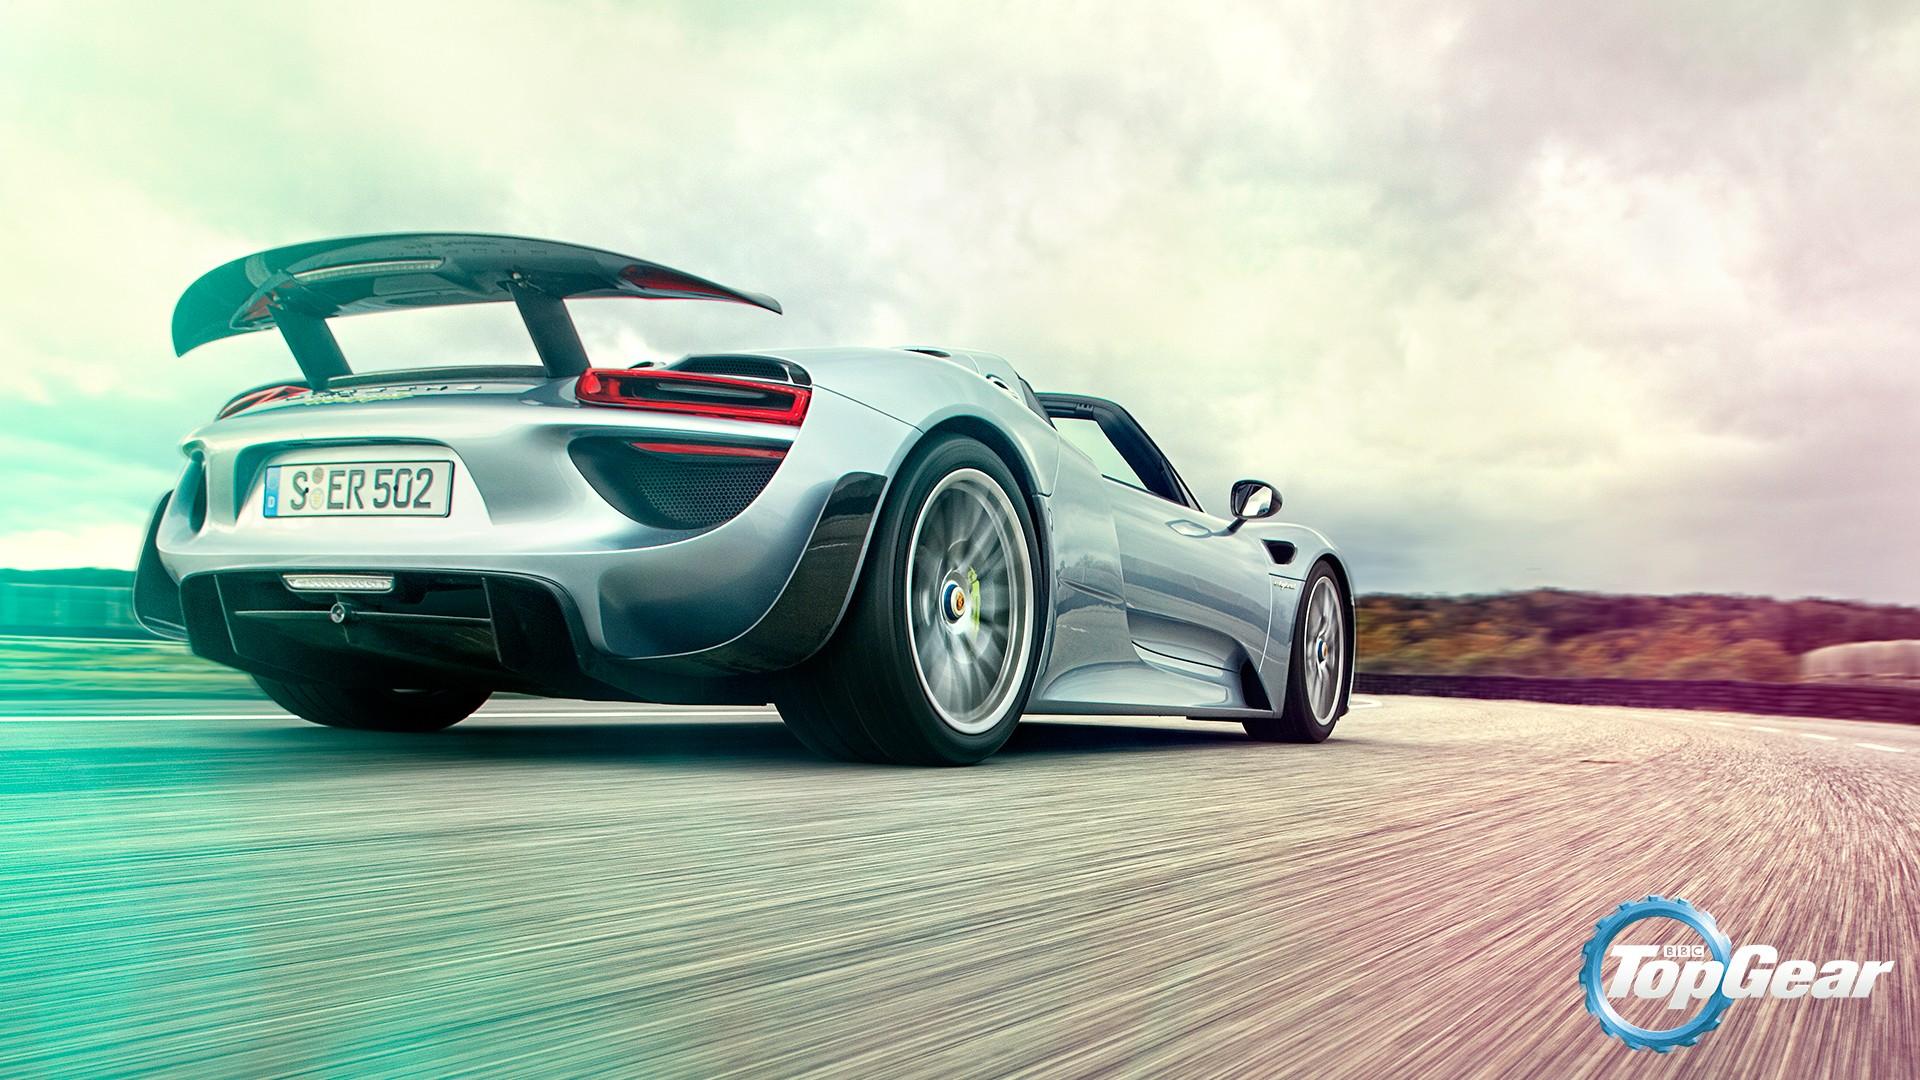 Car Vehicle Porsche Sports Performance 918 Spyder Top Gear Wheel Supercar Land